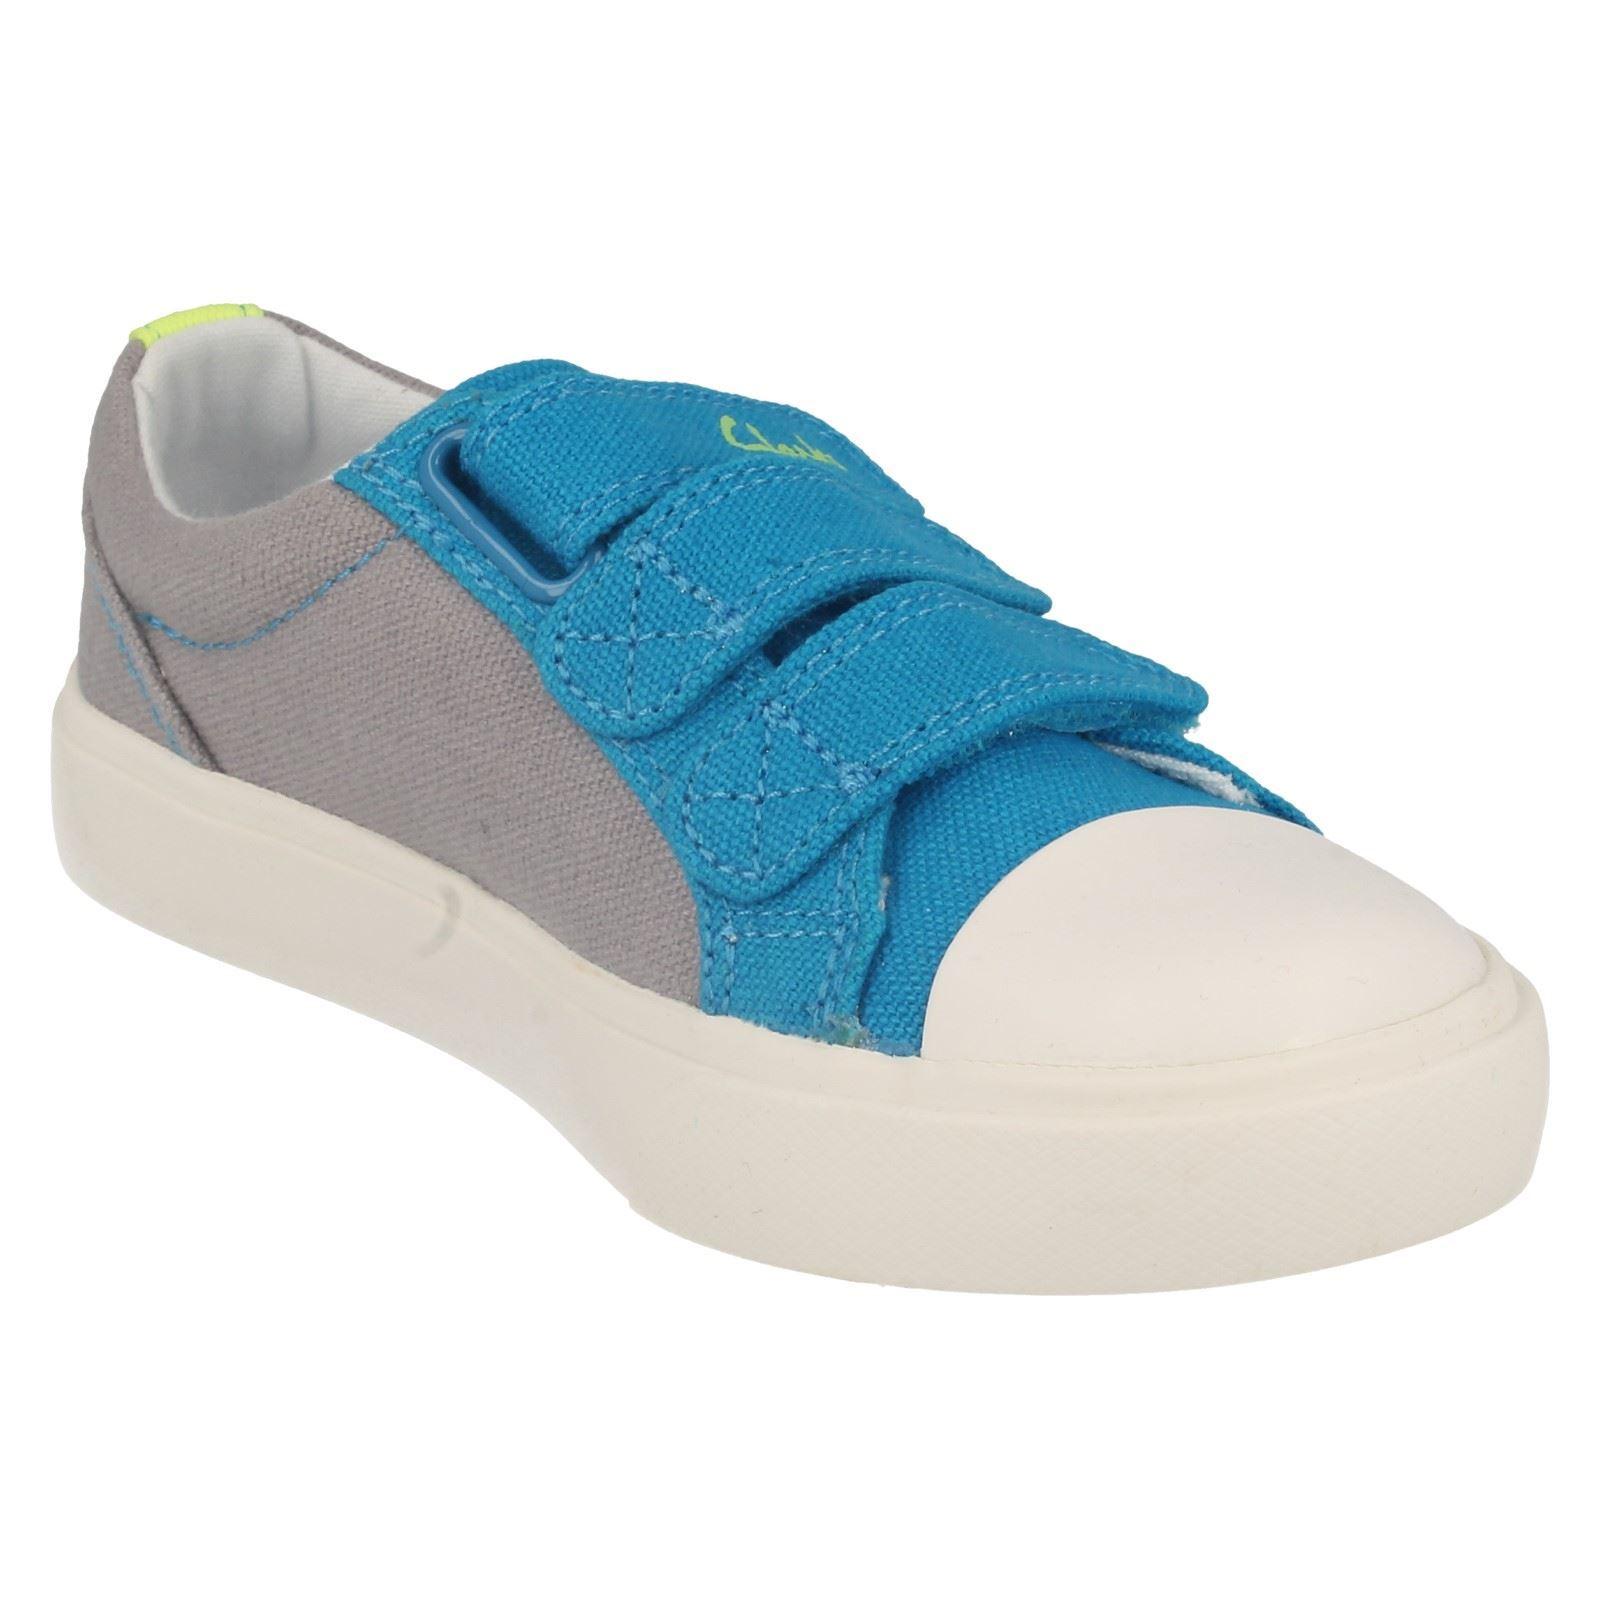 Boys Clarks Sasonal Canvas Summer Shoes Label - Club Halcy